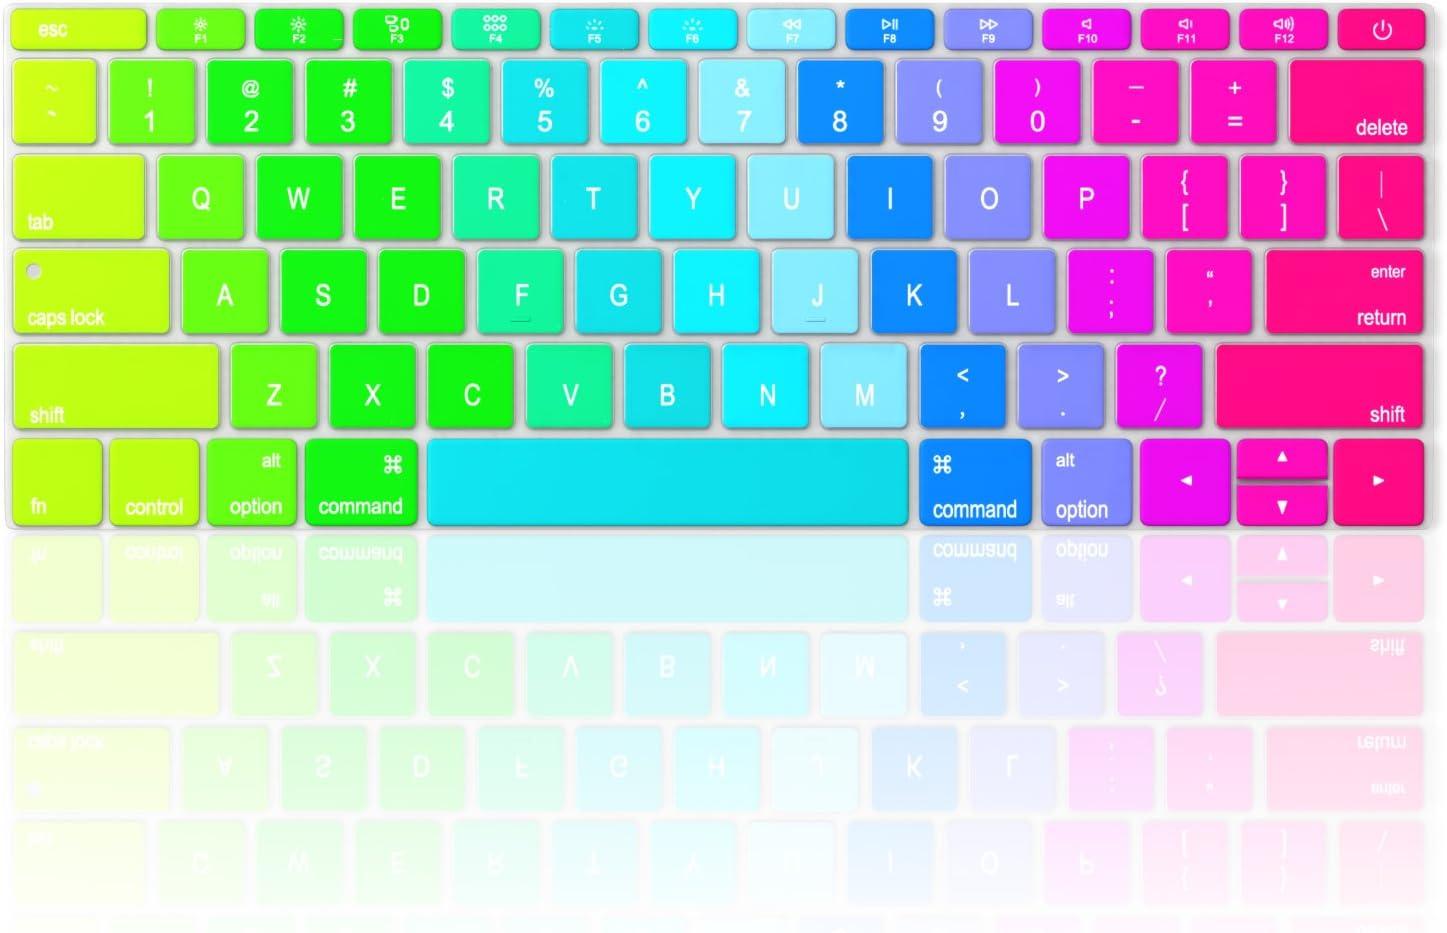 Rainbow No TouchBar Release 2016 /& MacBook 12 A1534 Newest Silicone Skin Rainbow Keyboard Cover for MacBook Pro 13 inch A1708 Kuzy